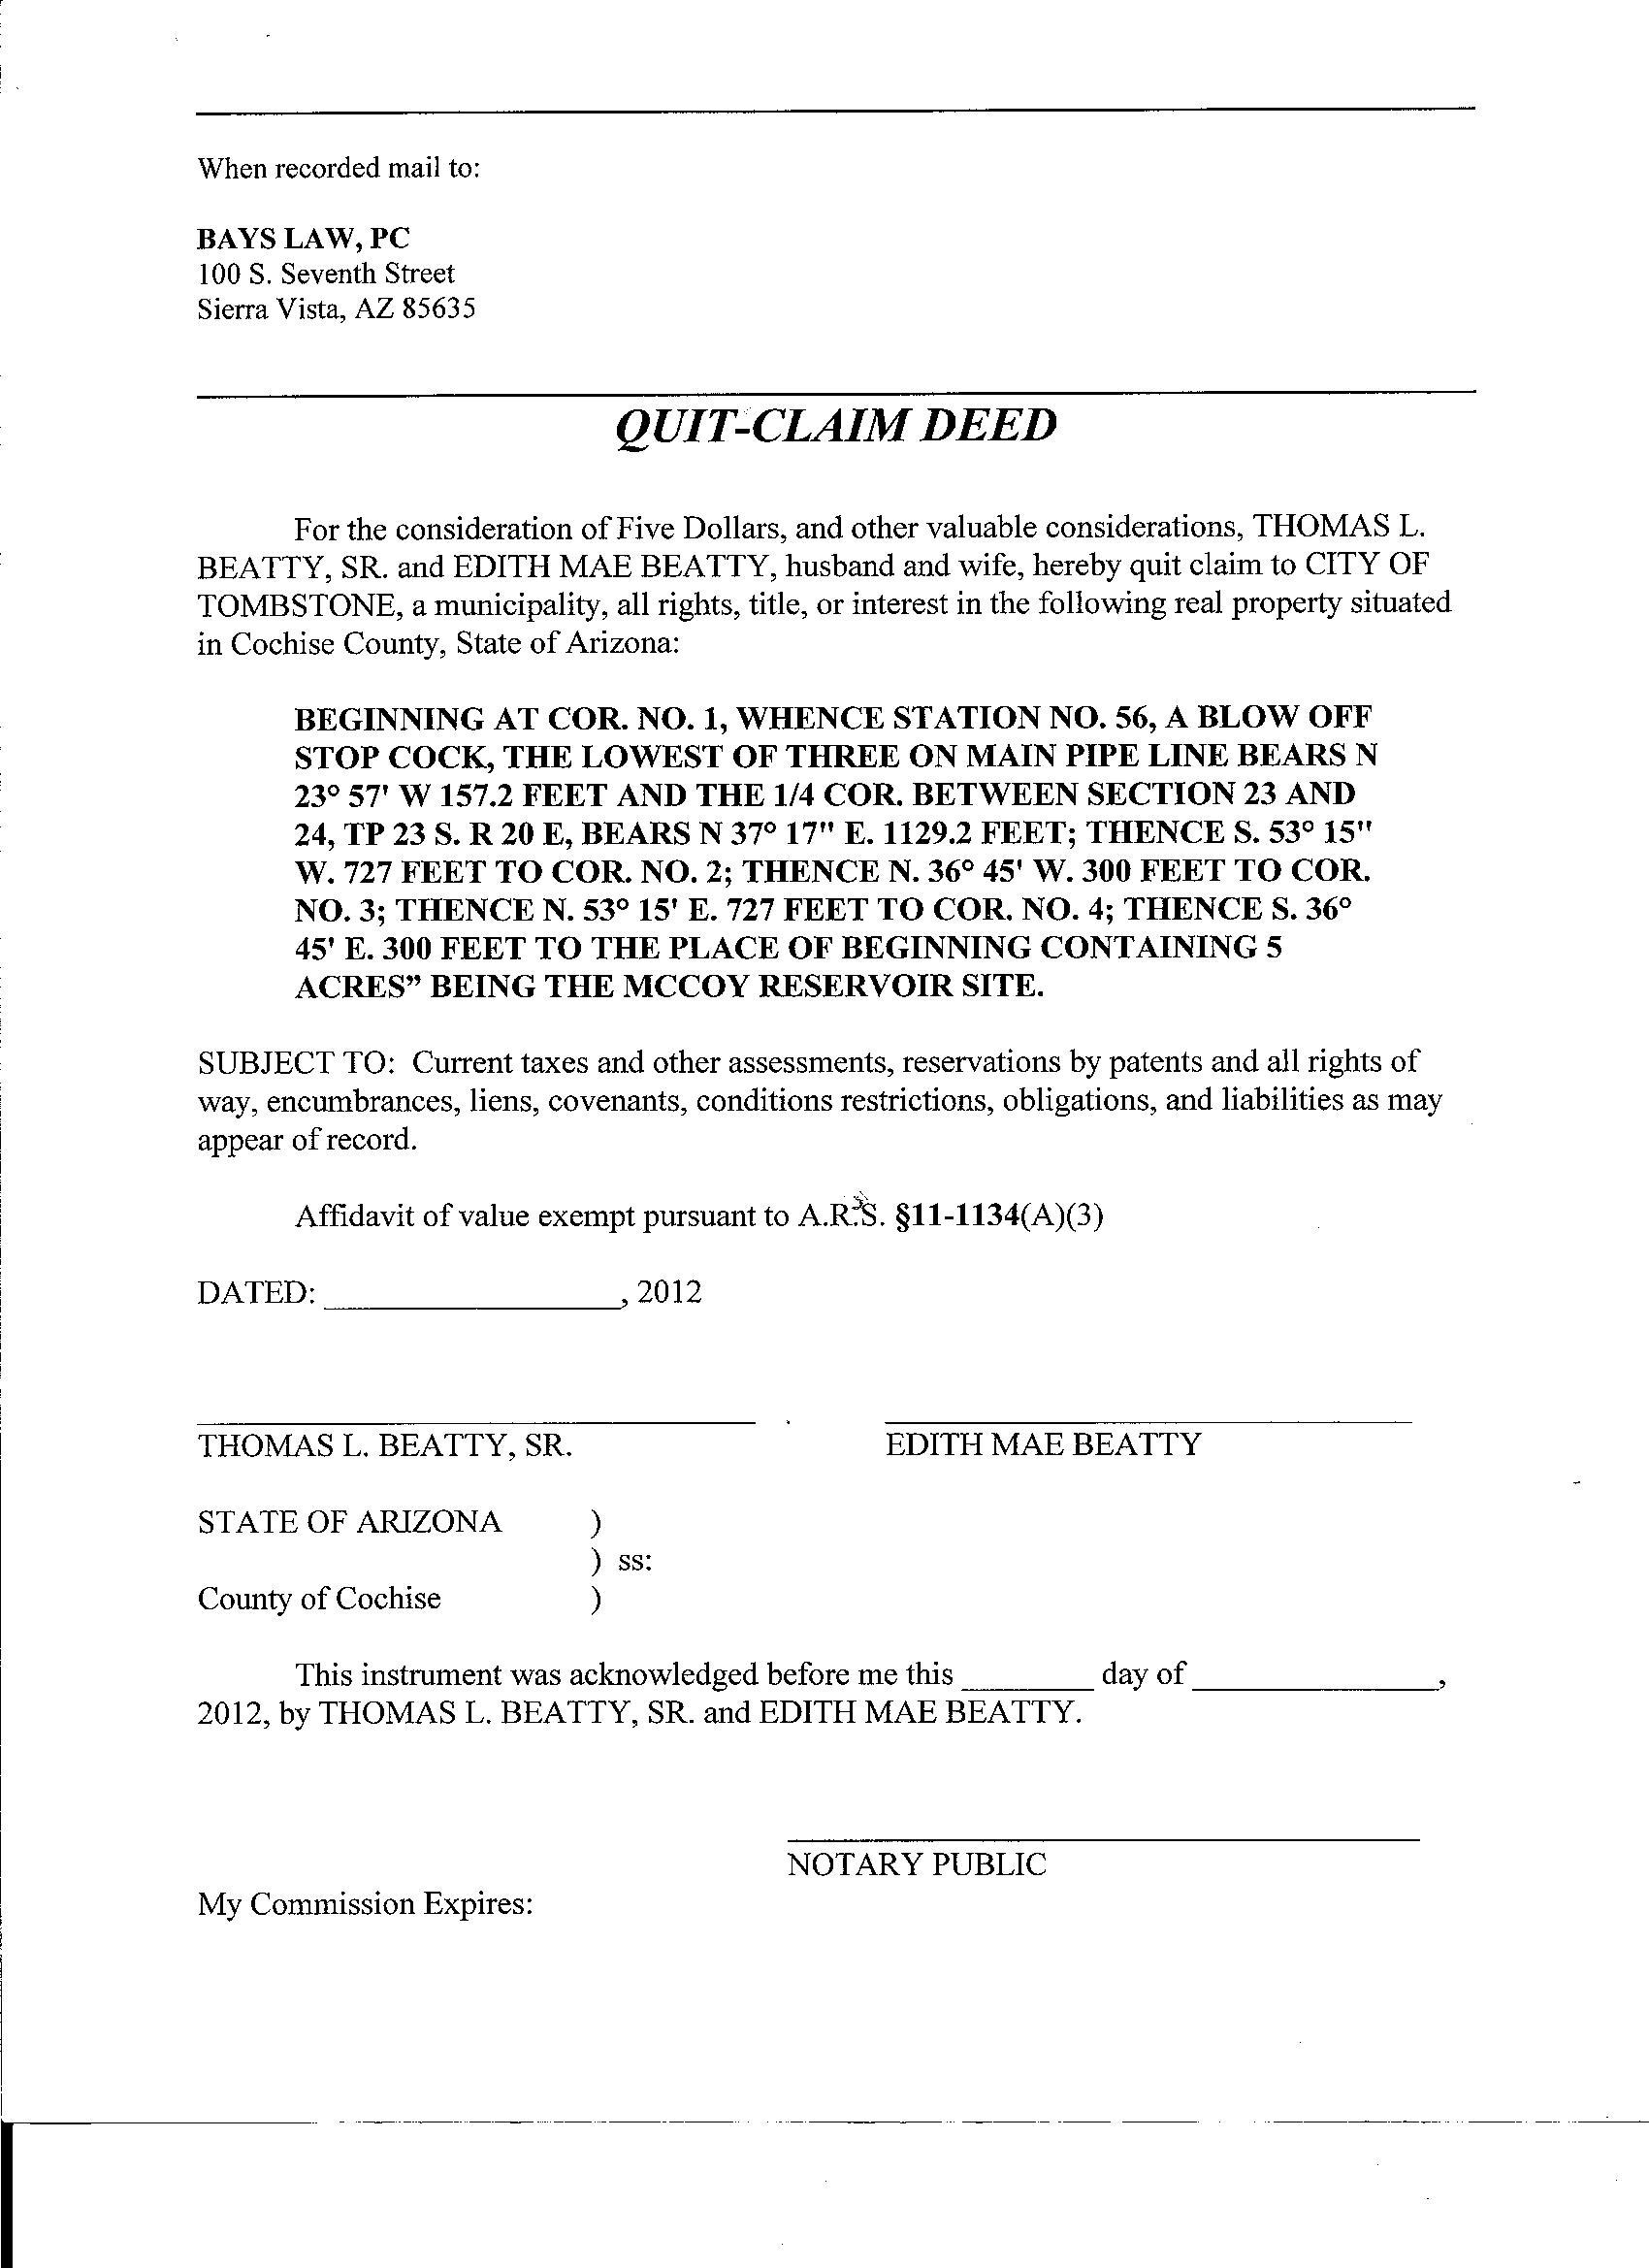 quit claim deed example